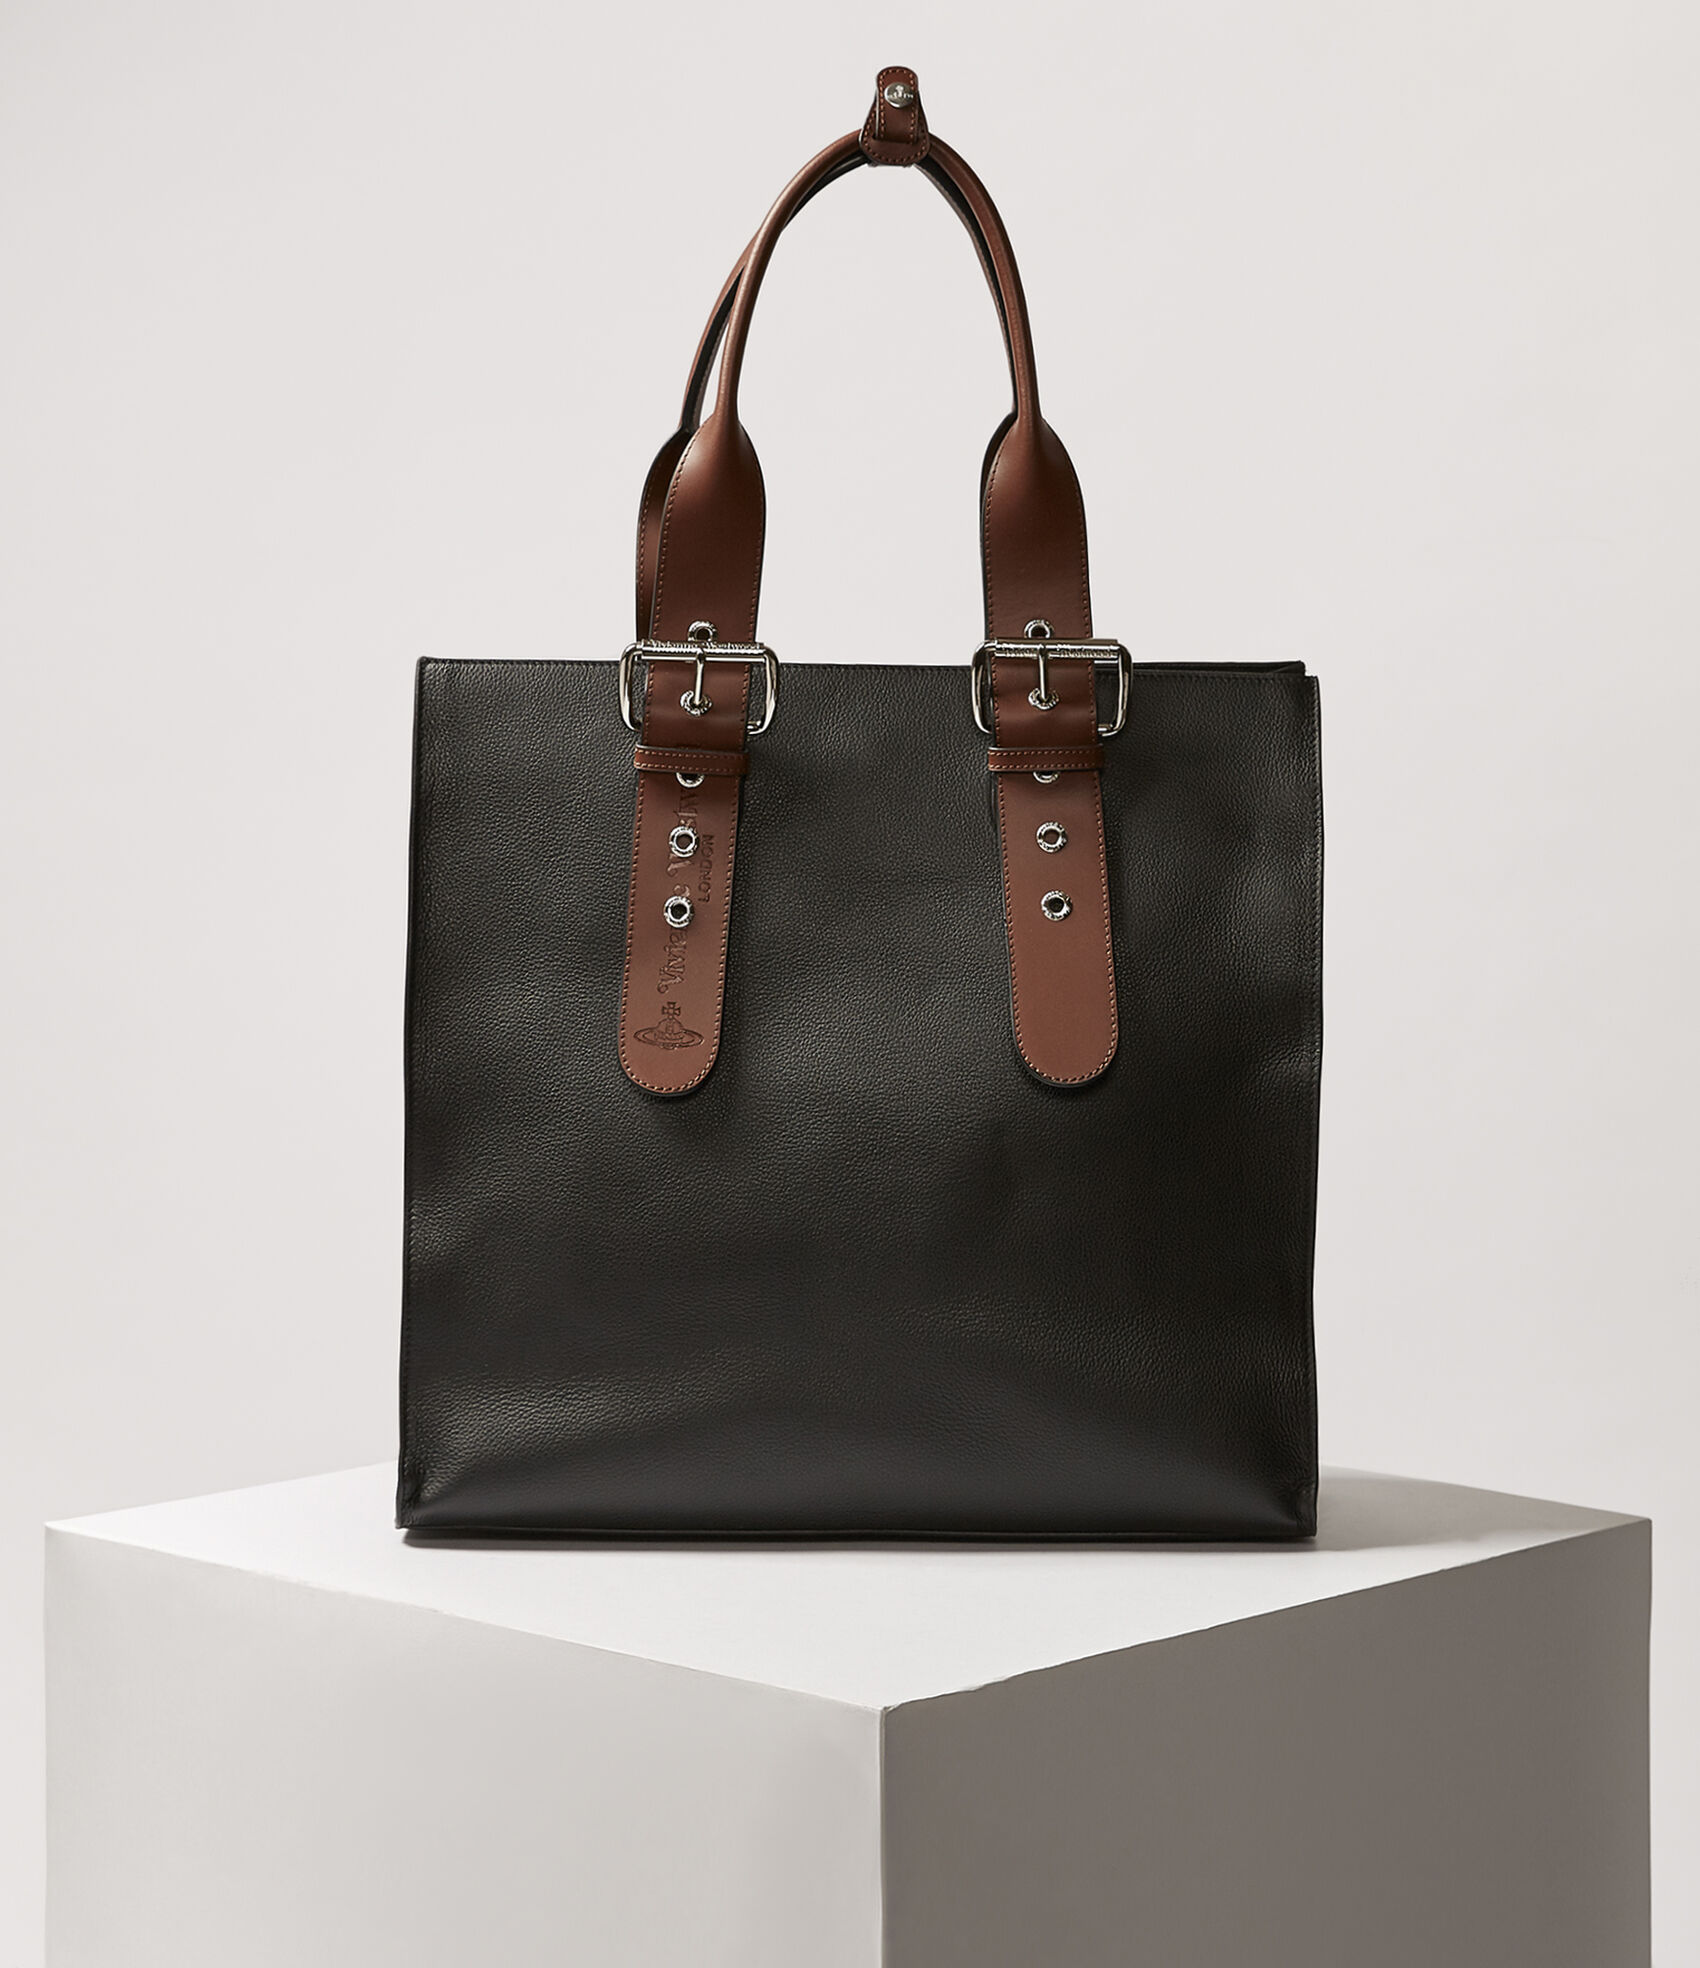 Vivienne Westwood Pouches And Doent Cases Men S Bags Alexander Tote Bag Black